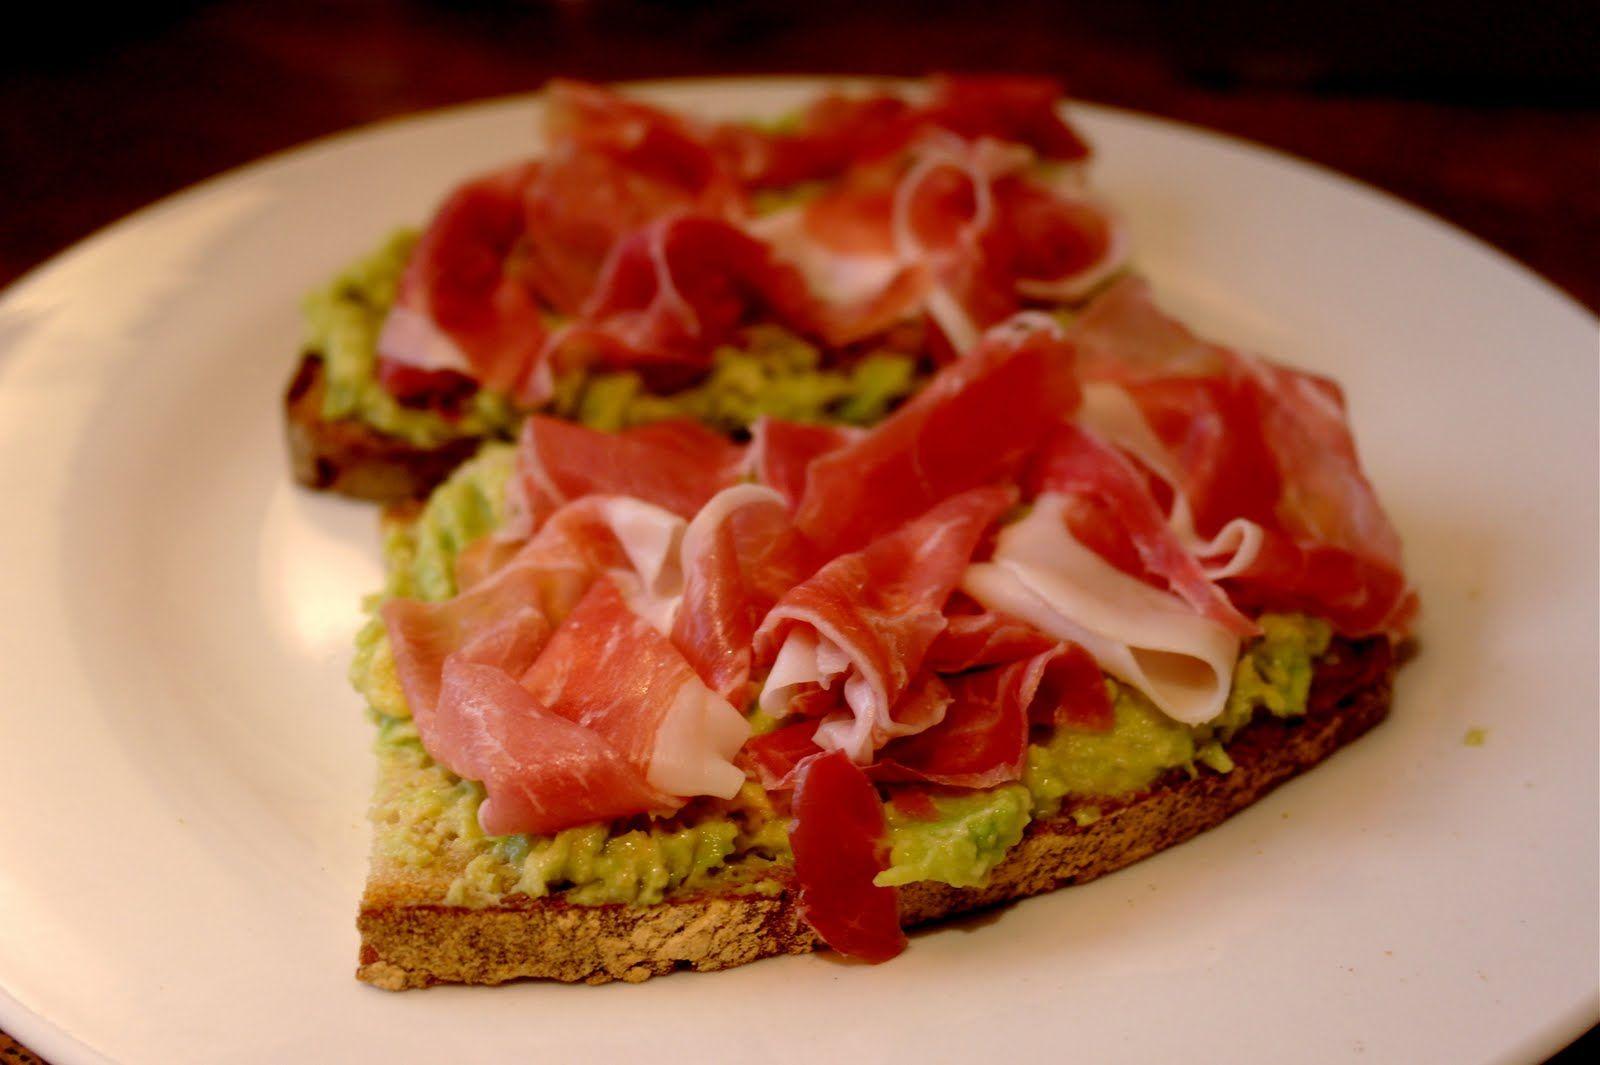 The Londoner: Roasted garlic guacamole & serrano ham on toast